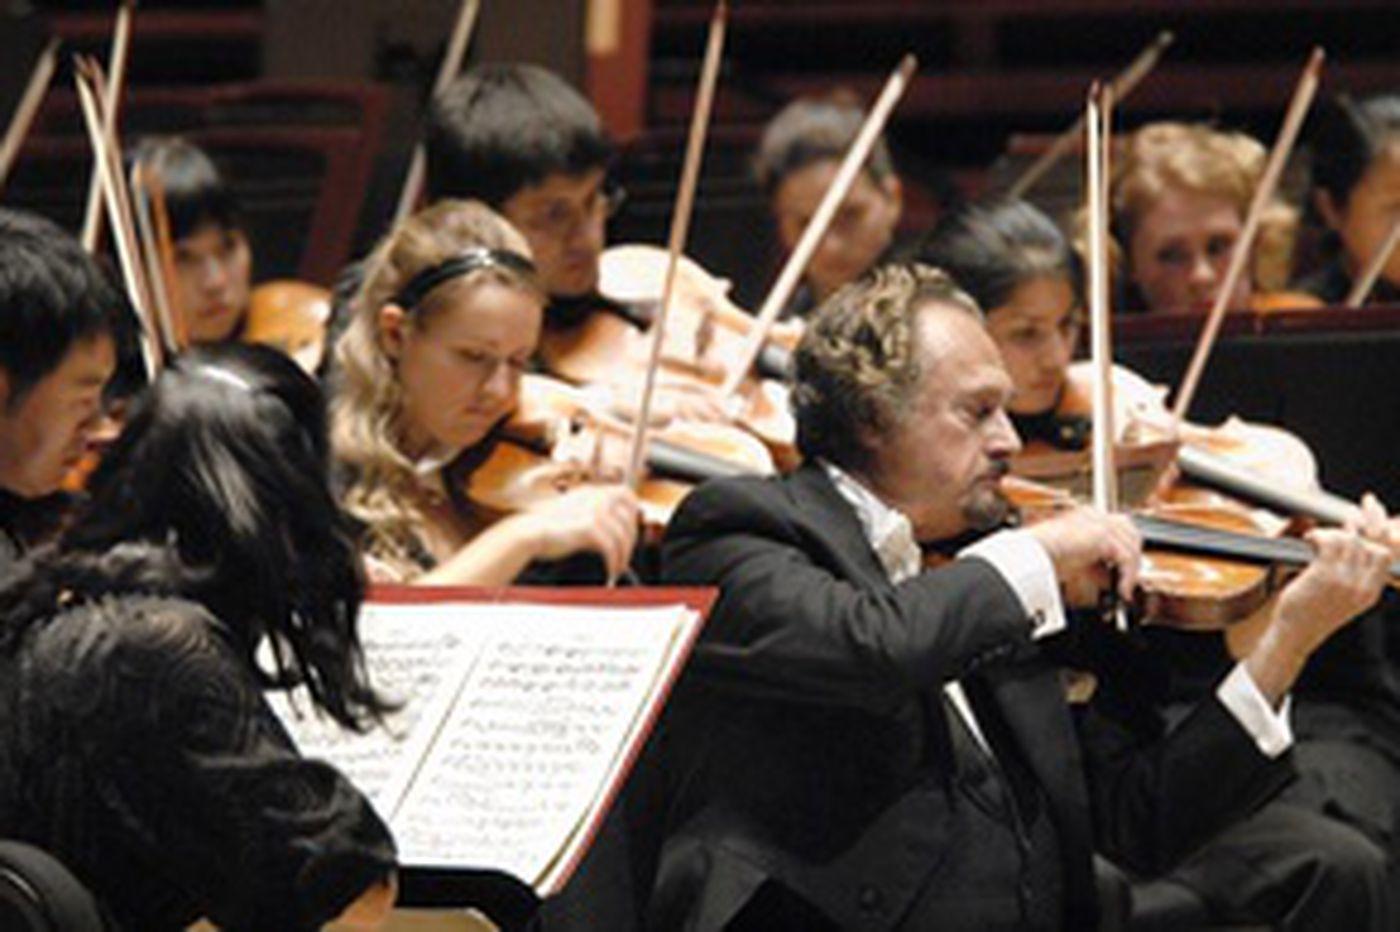 Violinist Aaron Rosand, 92, longtime Curtis Institute of Music professor